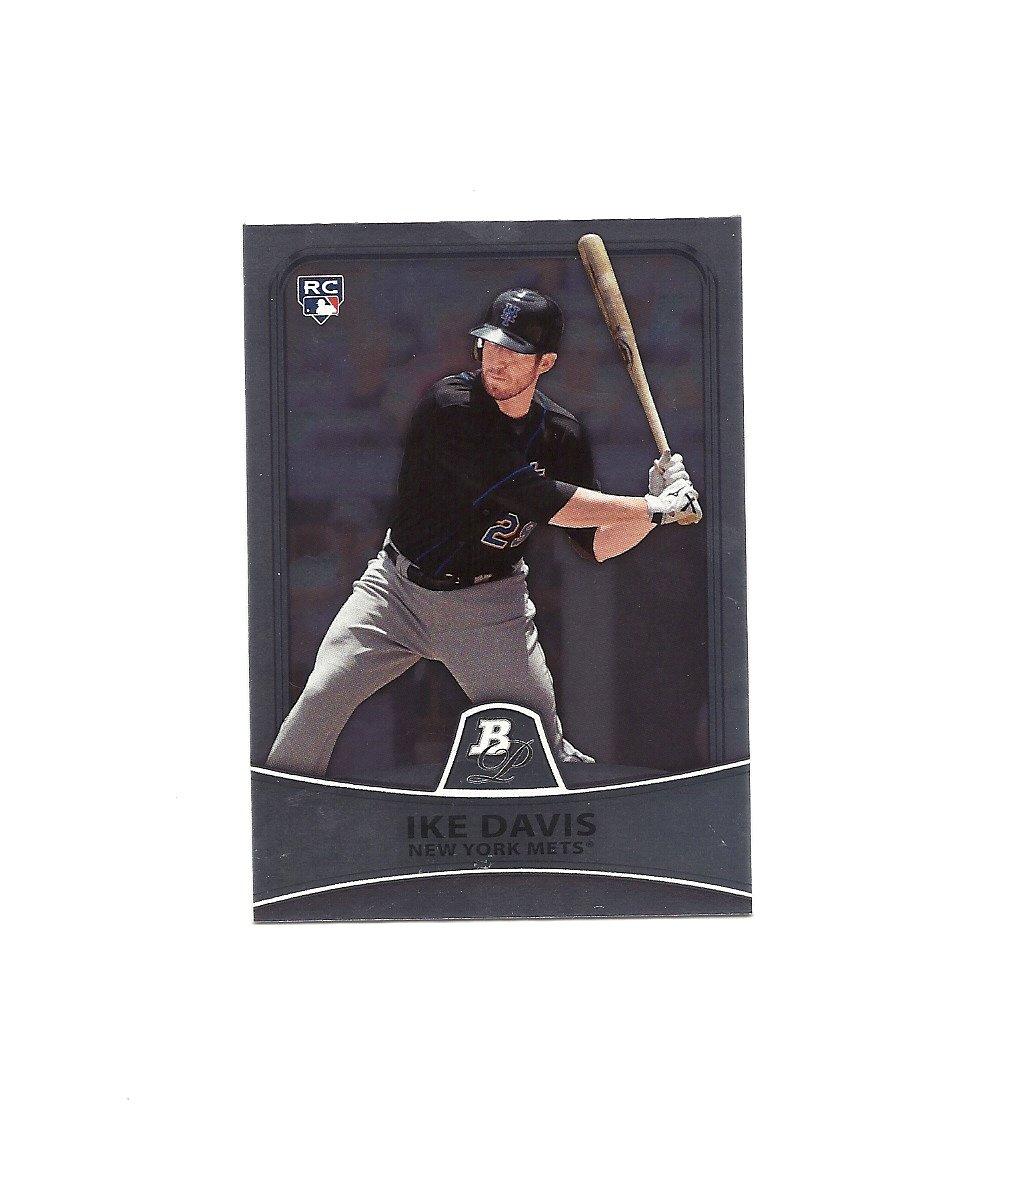 Ike Davis 2010 Bowman Platinum Rookie Card #66 New York Mets